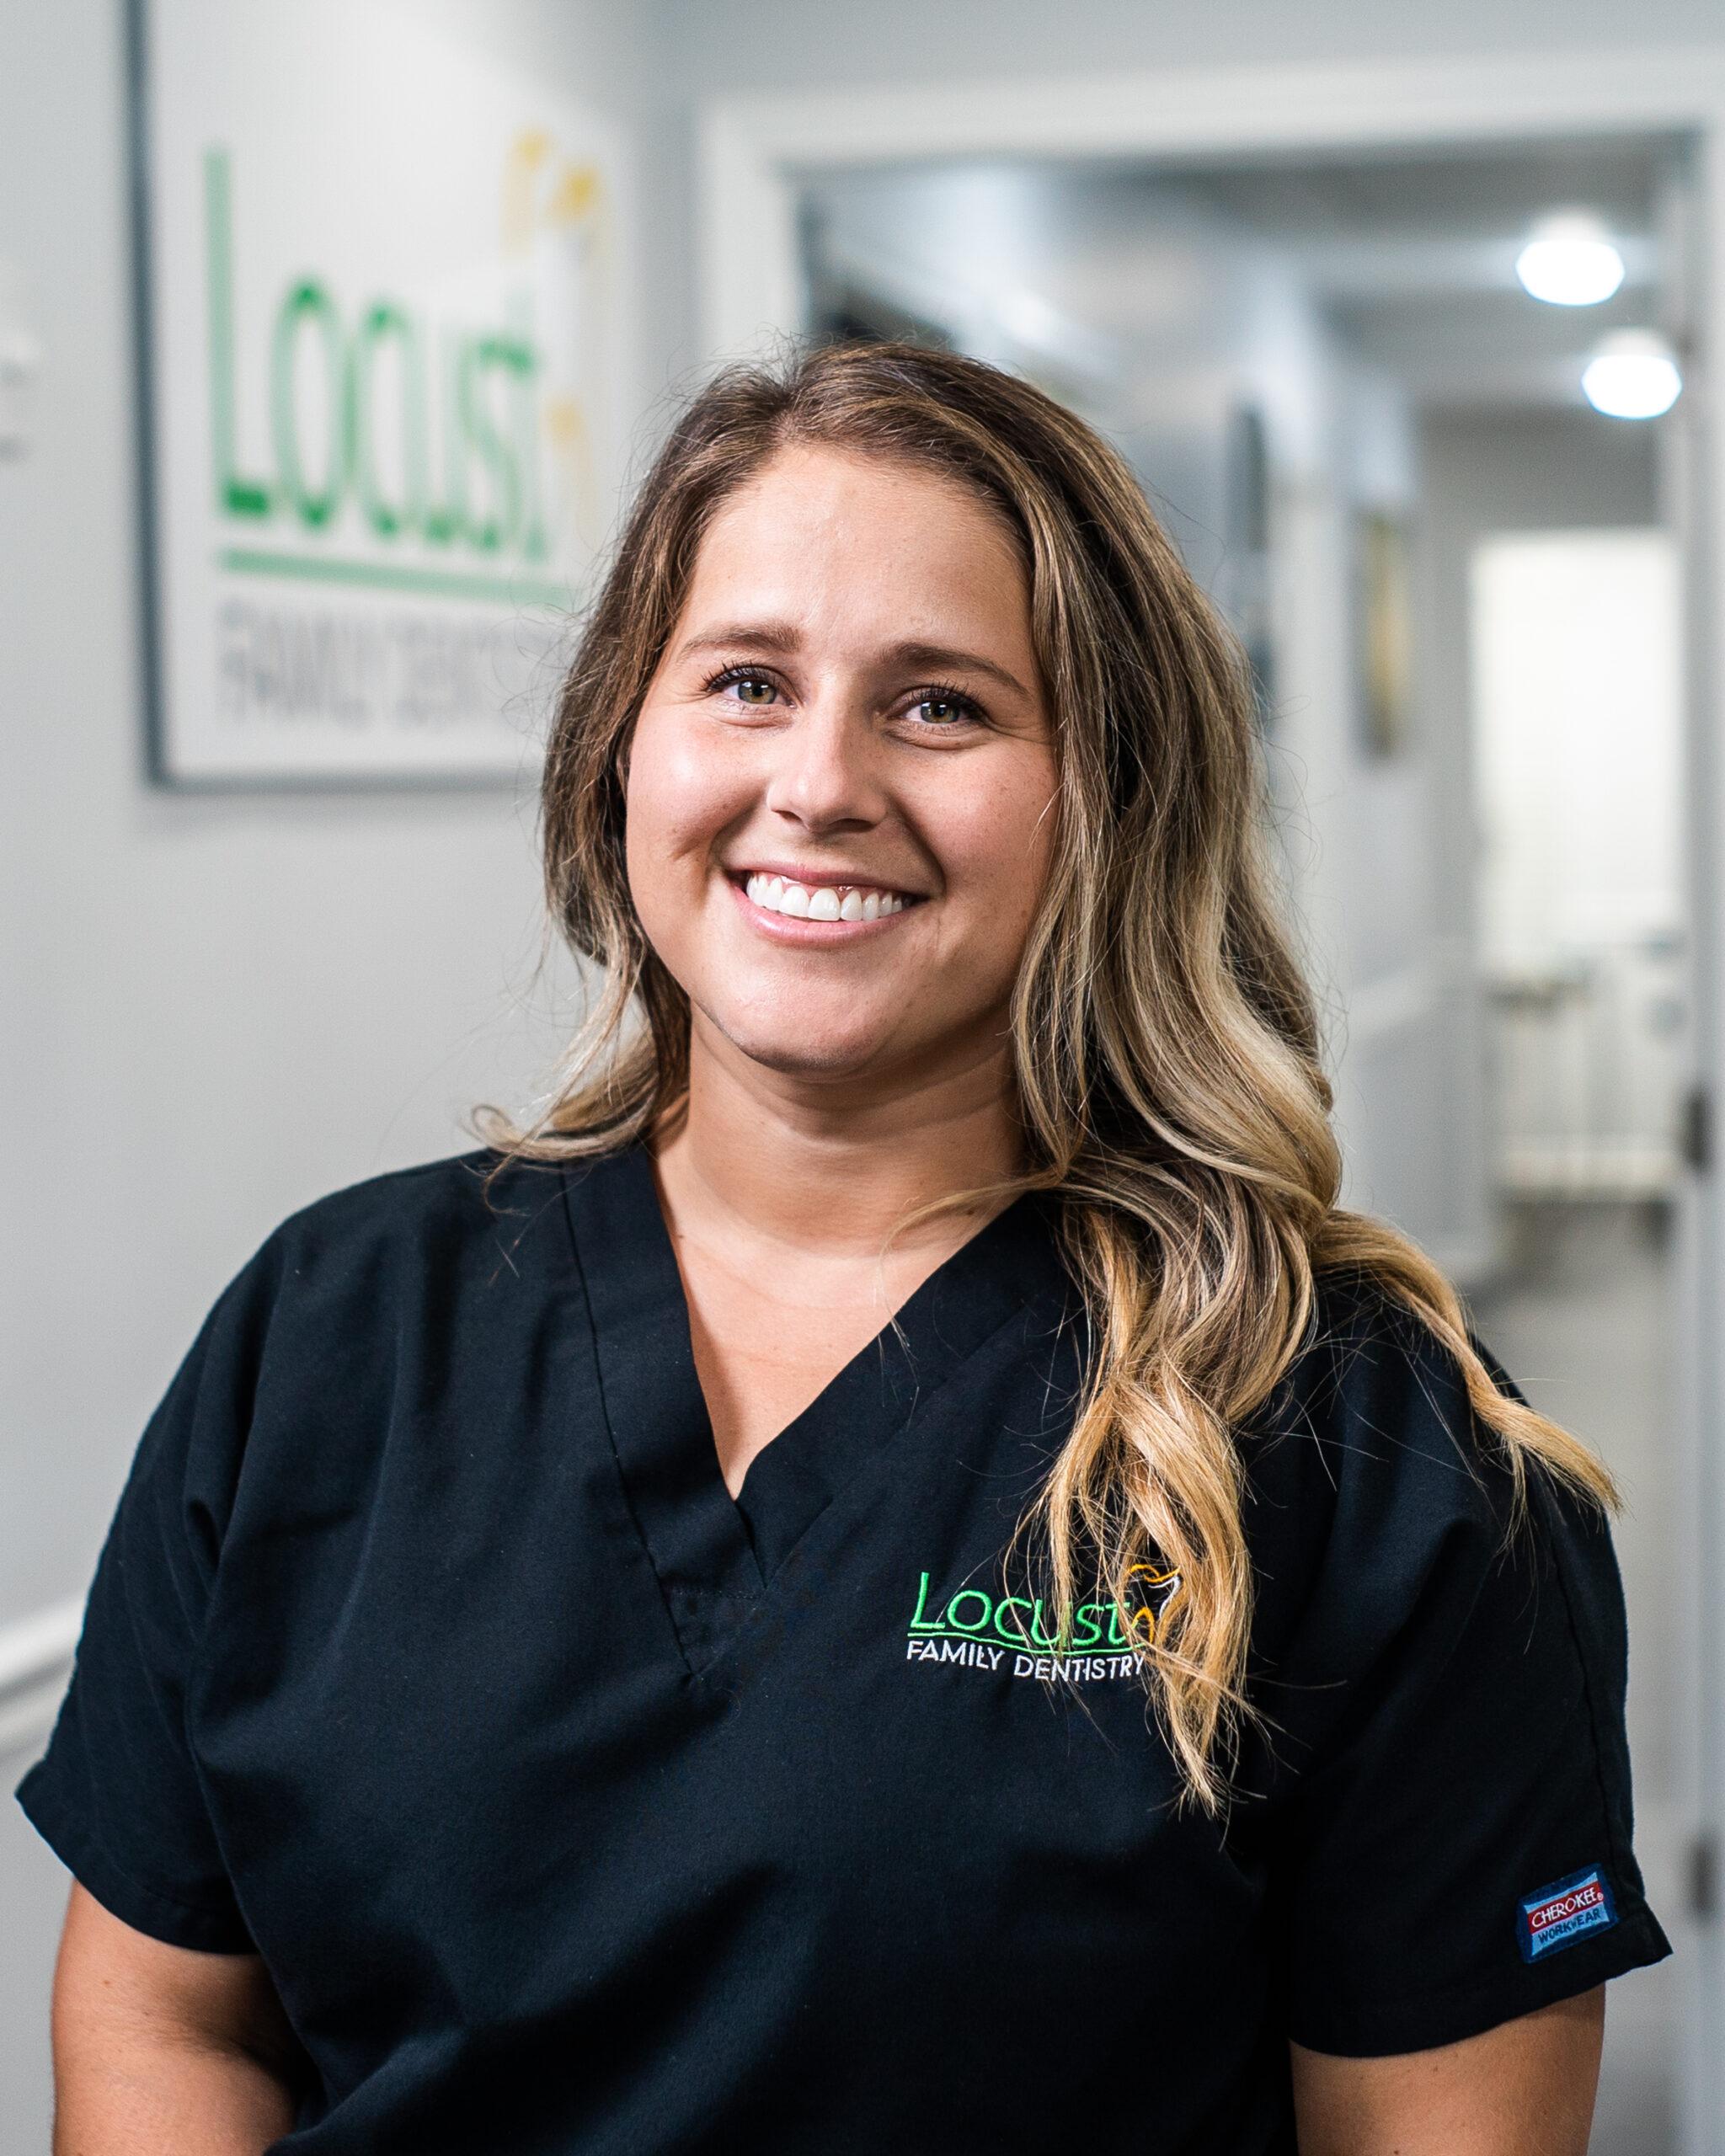 Trixie Morton, Dental Assistant, Locust Family Dentistry